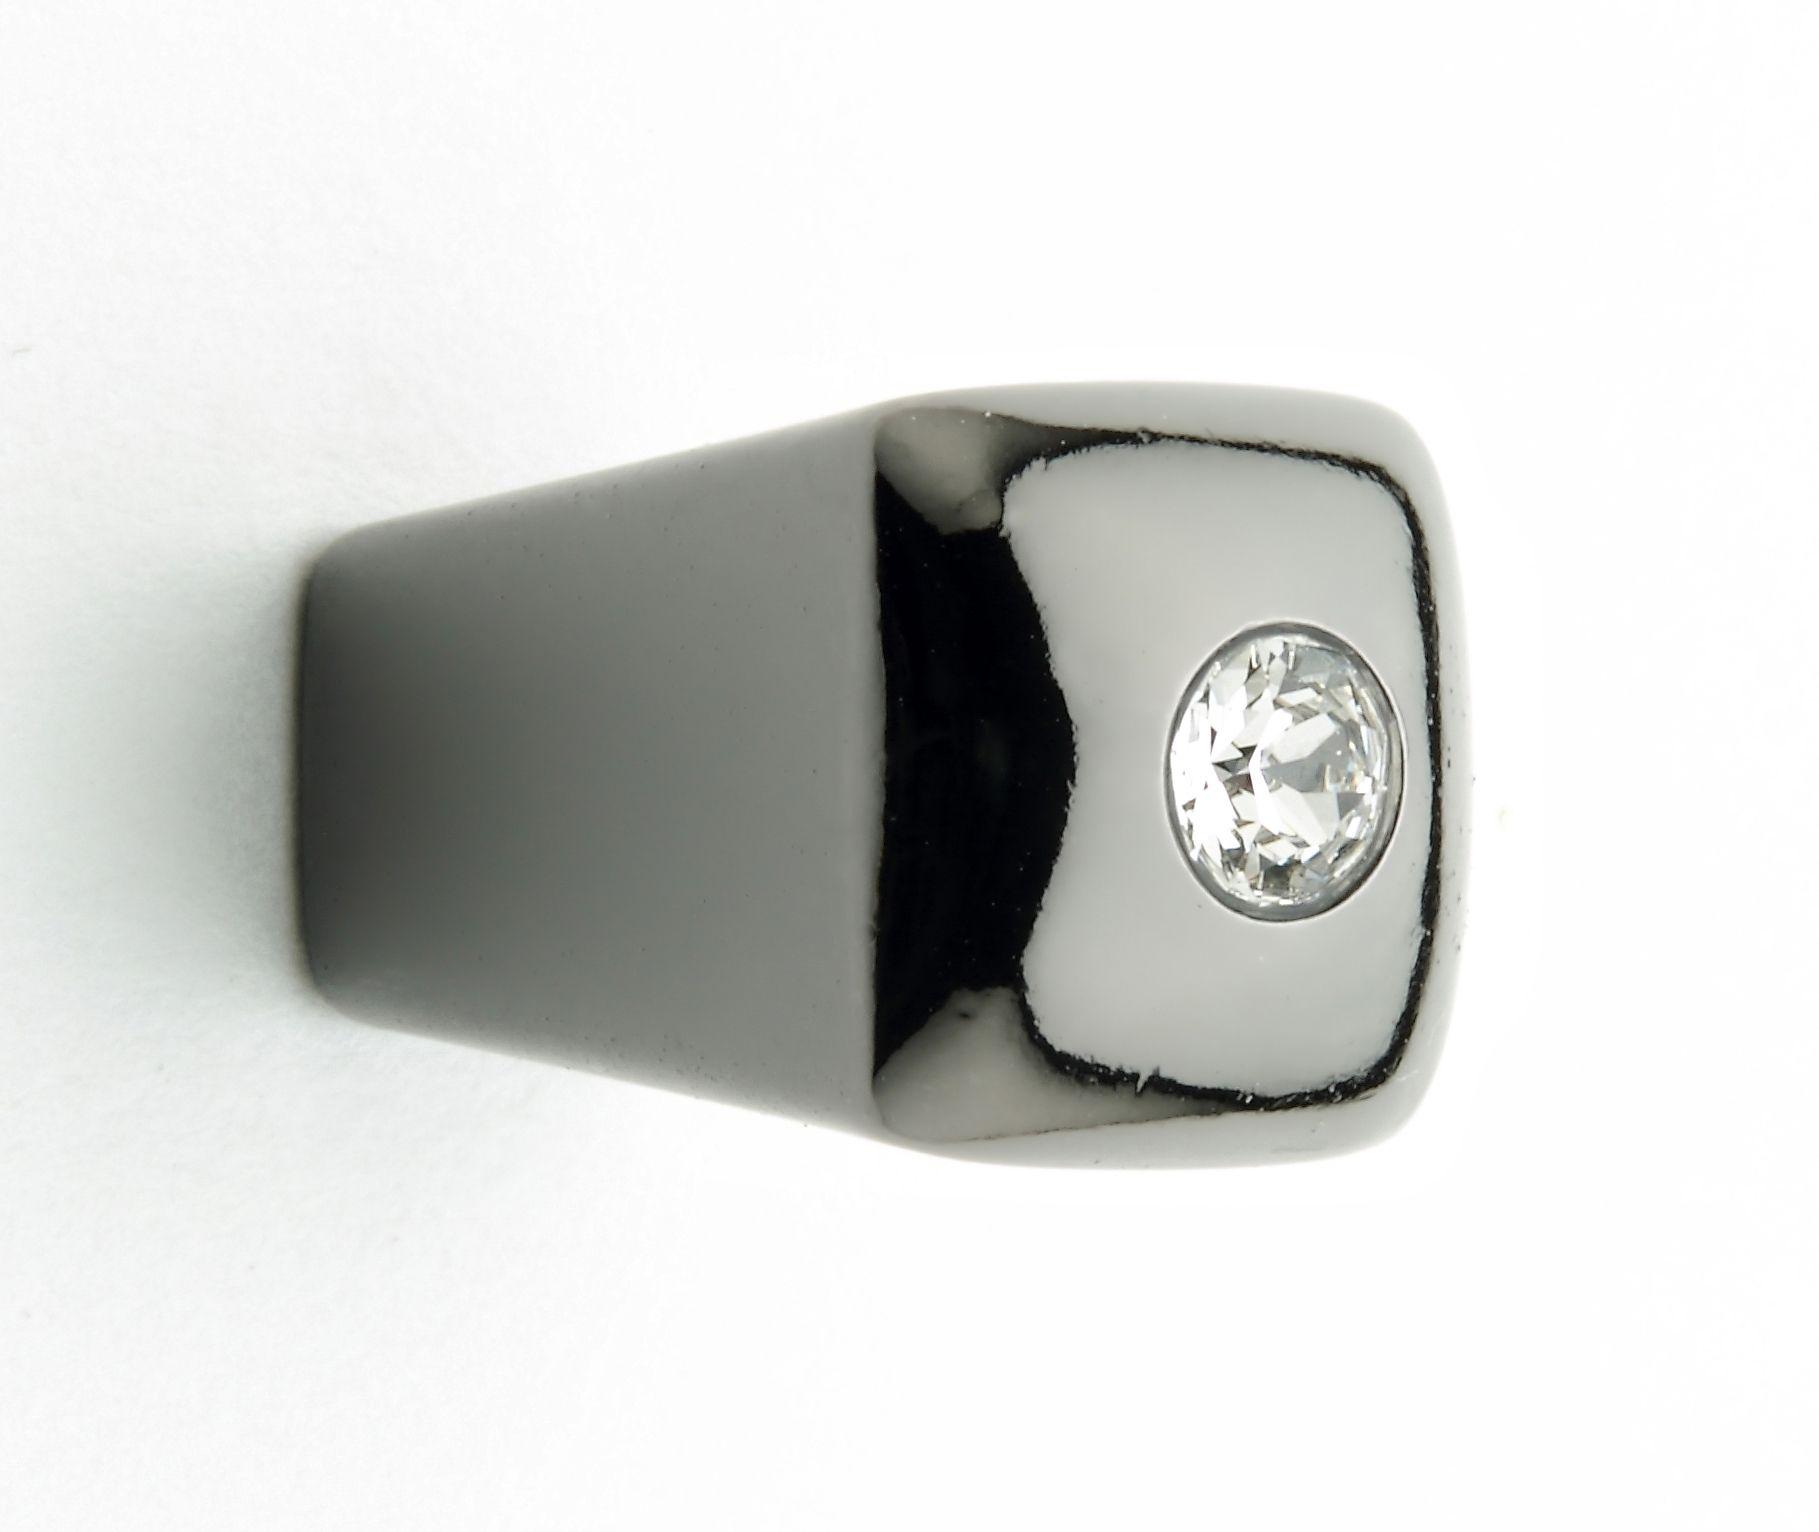 Citterio Giulio crystals modern knob.